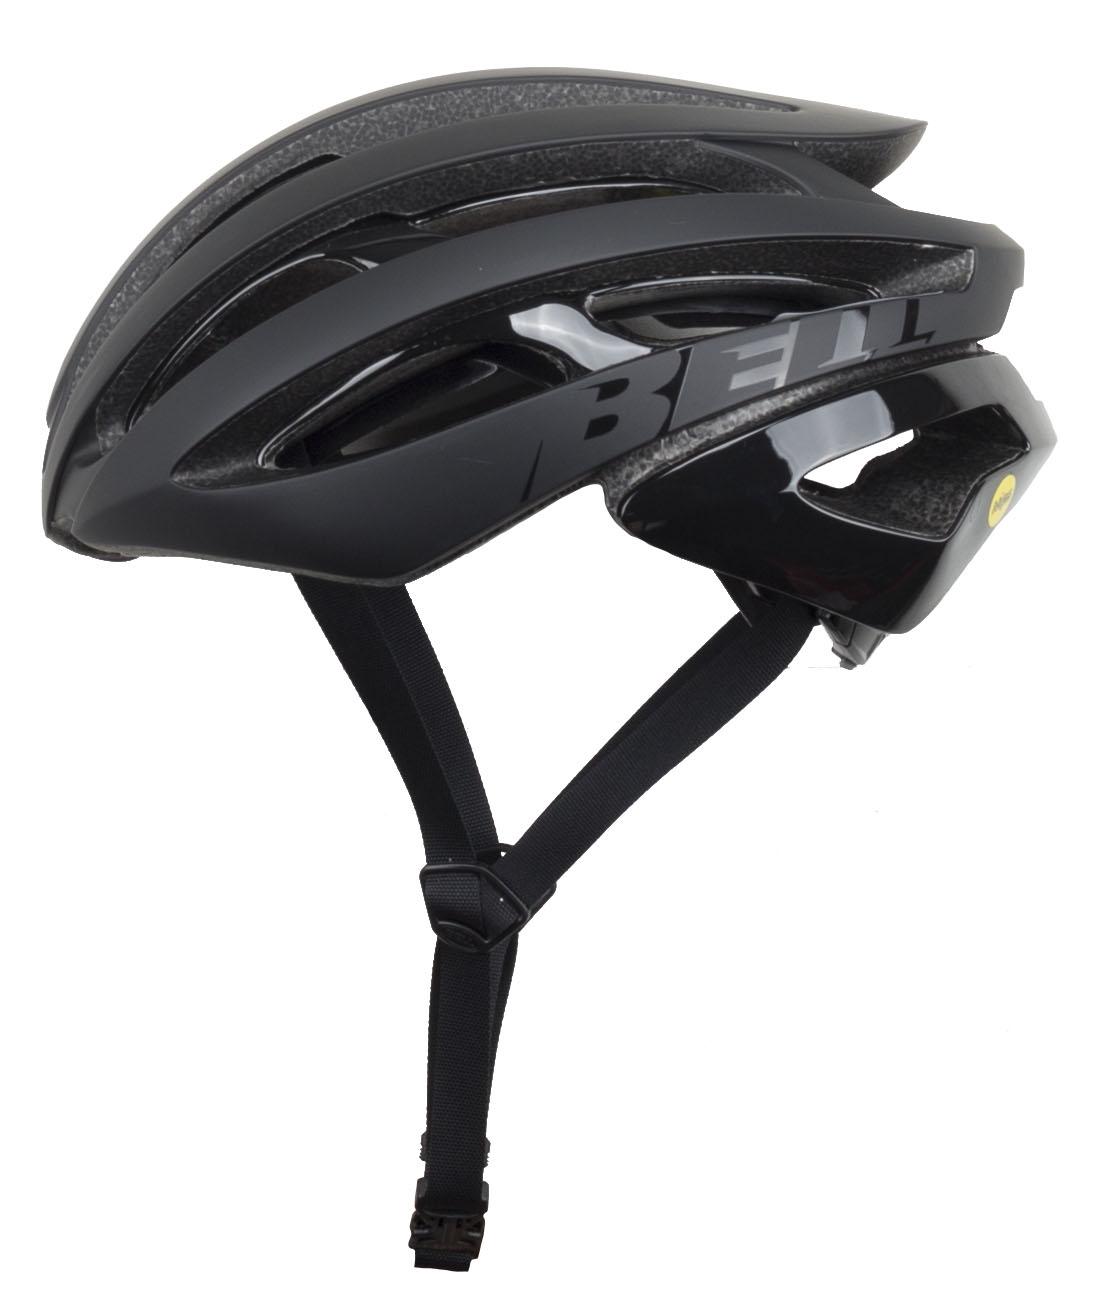 Bell Z20 Mips Road Helmet Men's Size Large in Black